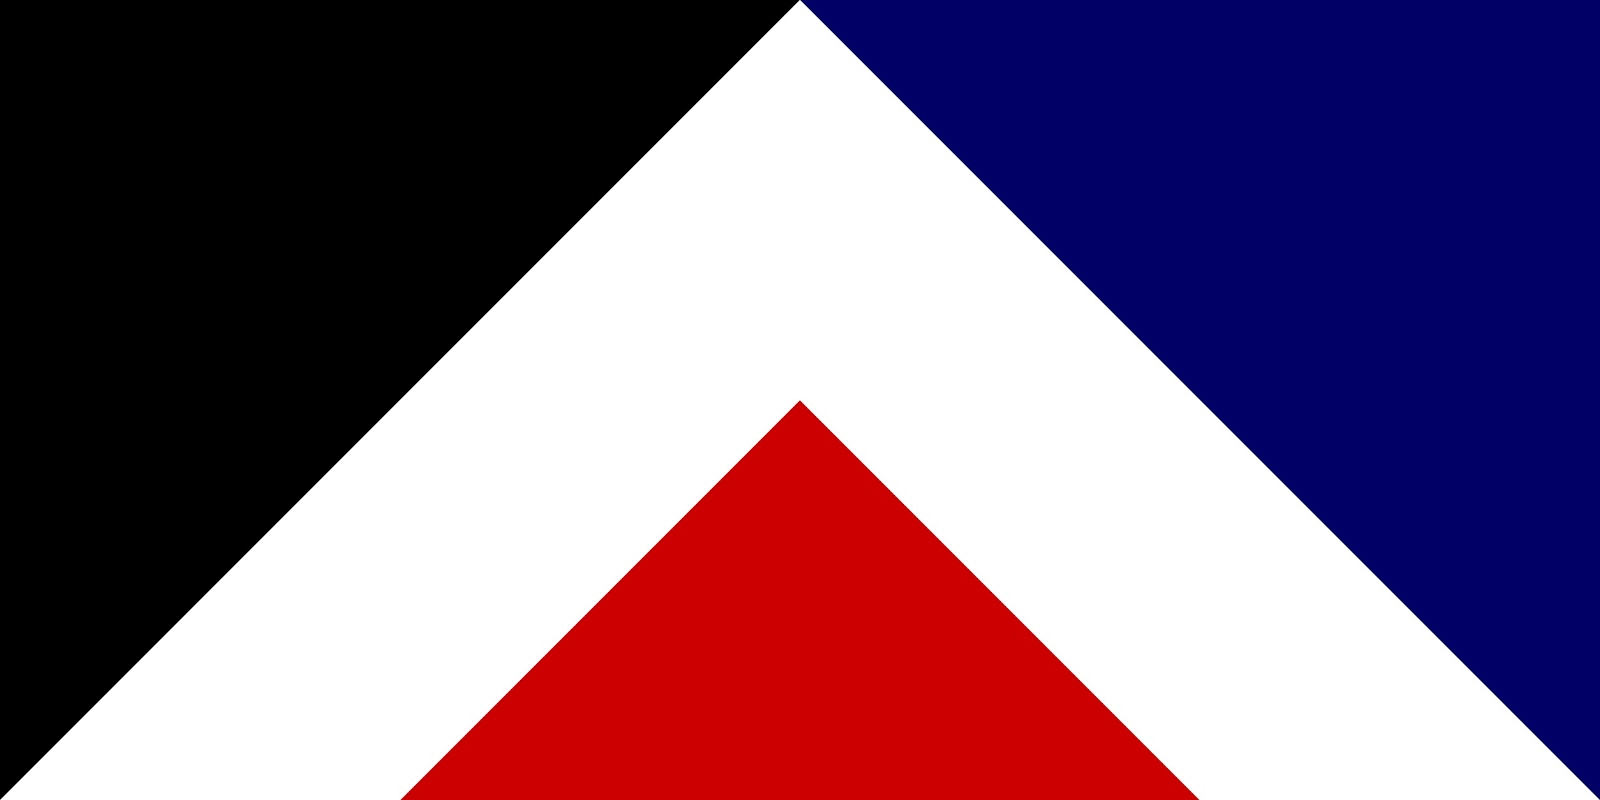 AmeriNZ Blog: \'Red Peak\' raises a red flag